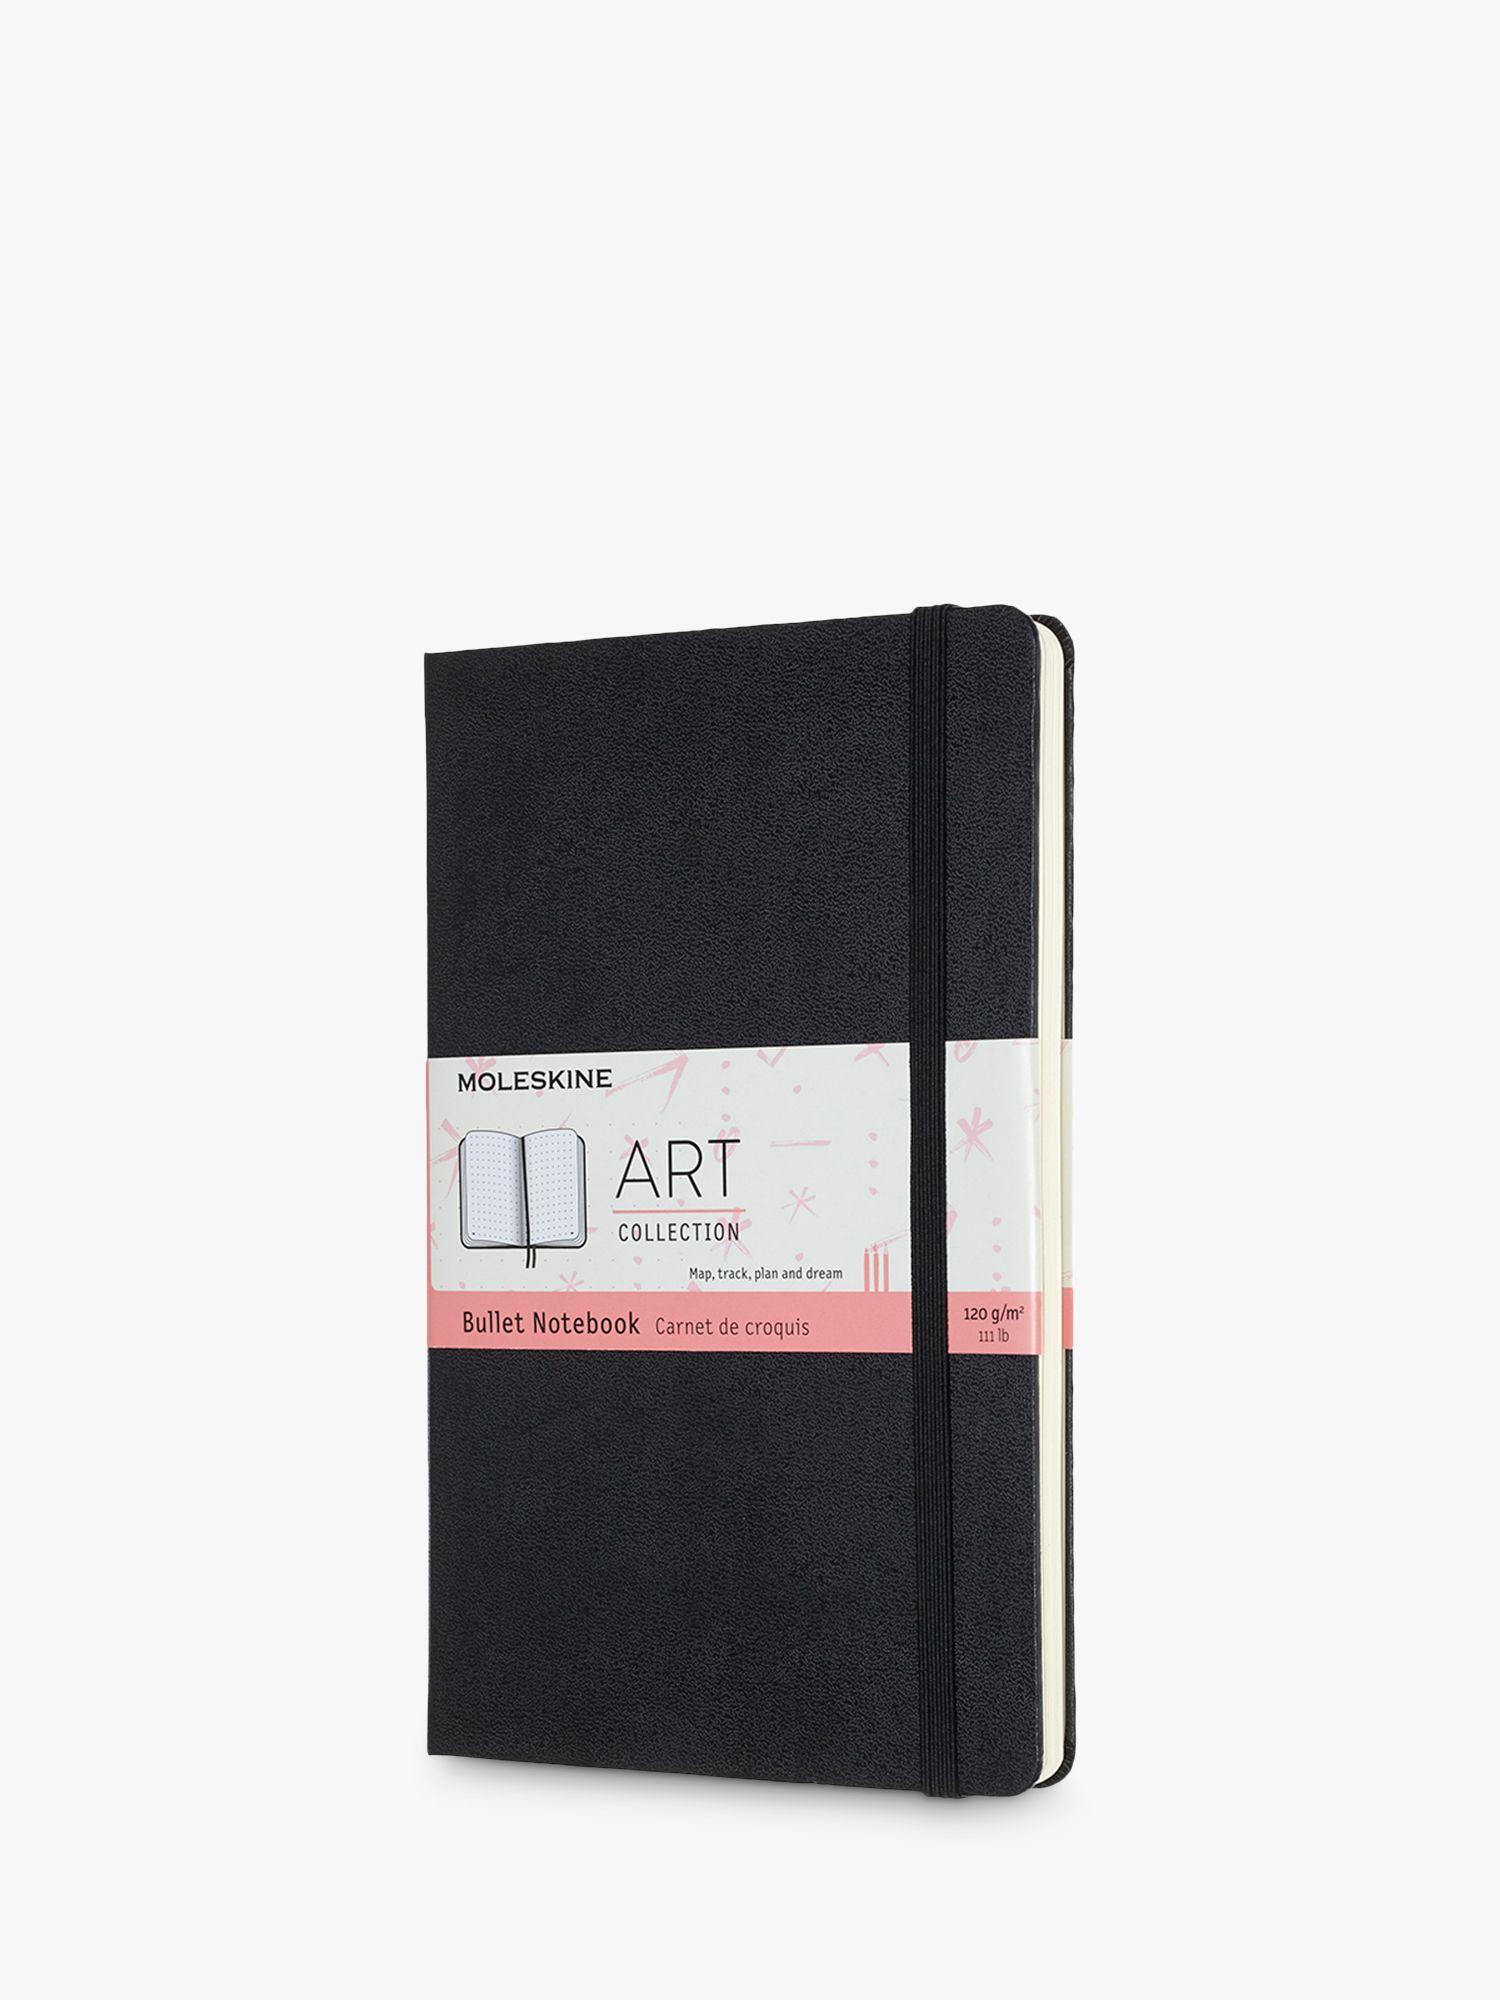 Moleskine Moleskine Large Art Bullet Notebook, Black